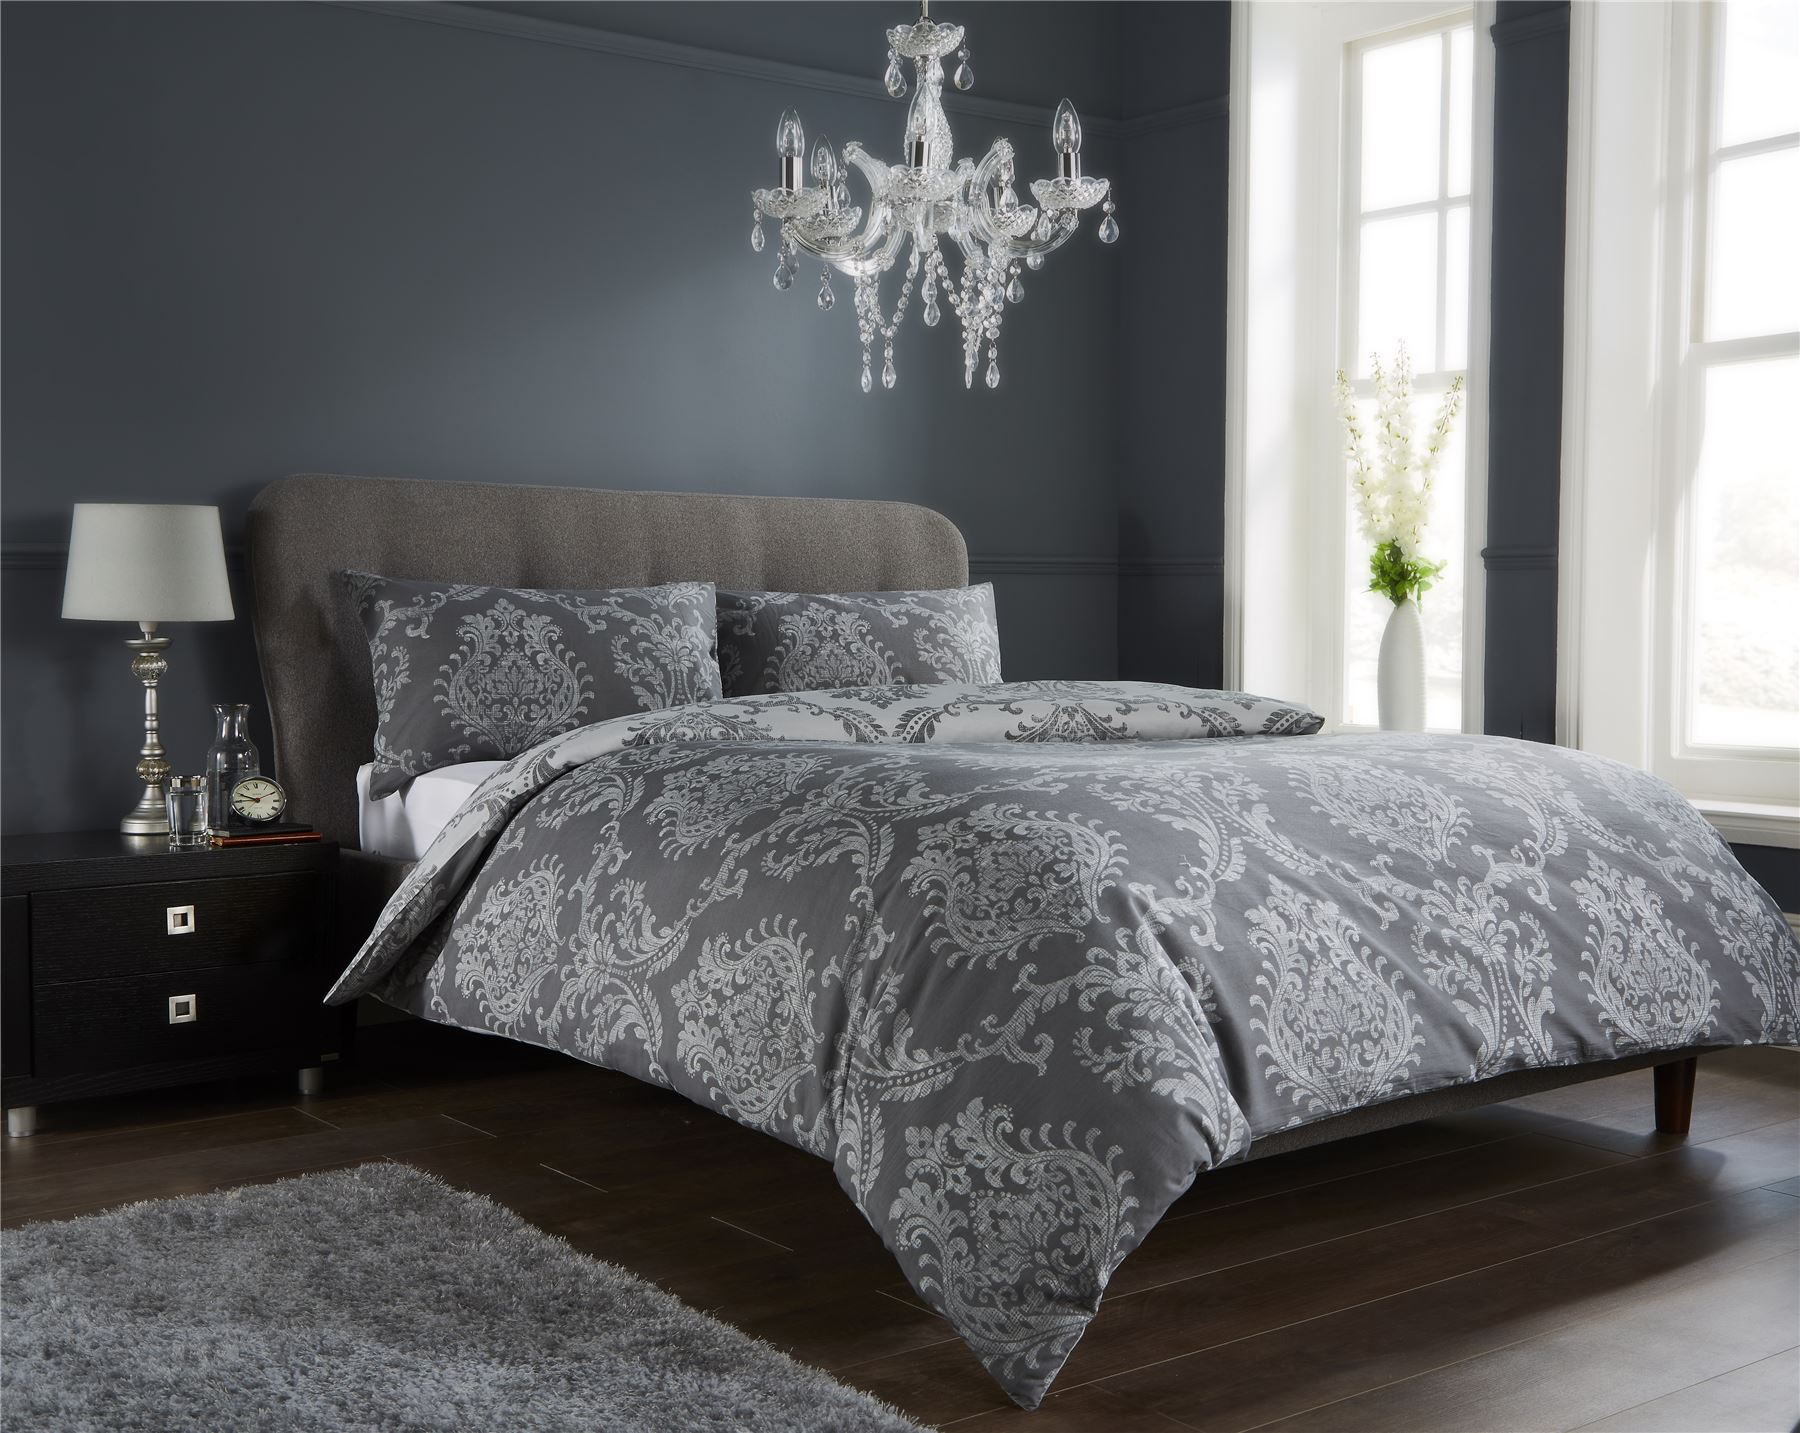 Damask Duvet Quilt Cover Set Bed Linen Double King Size